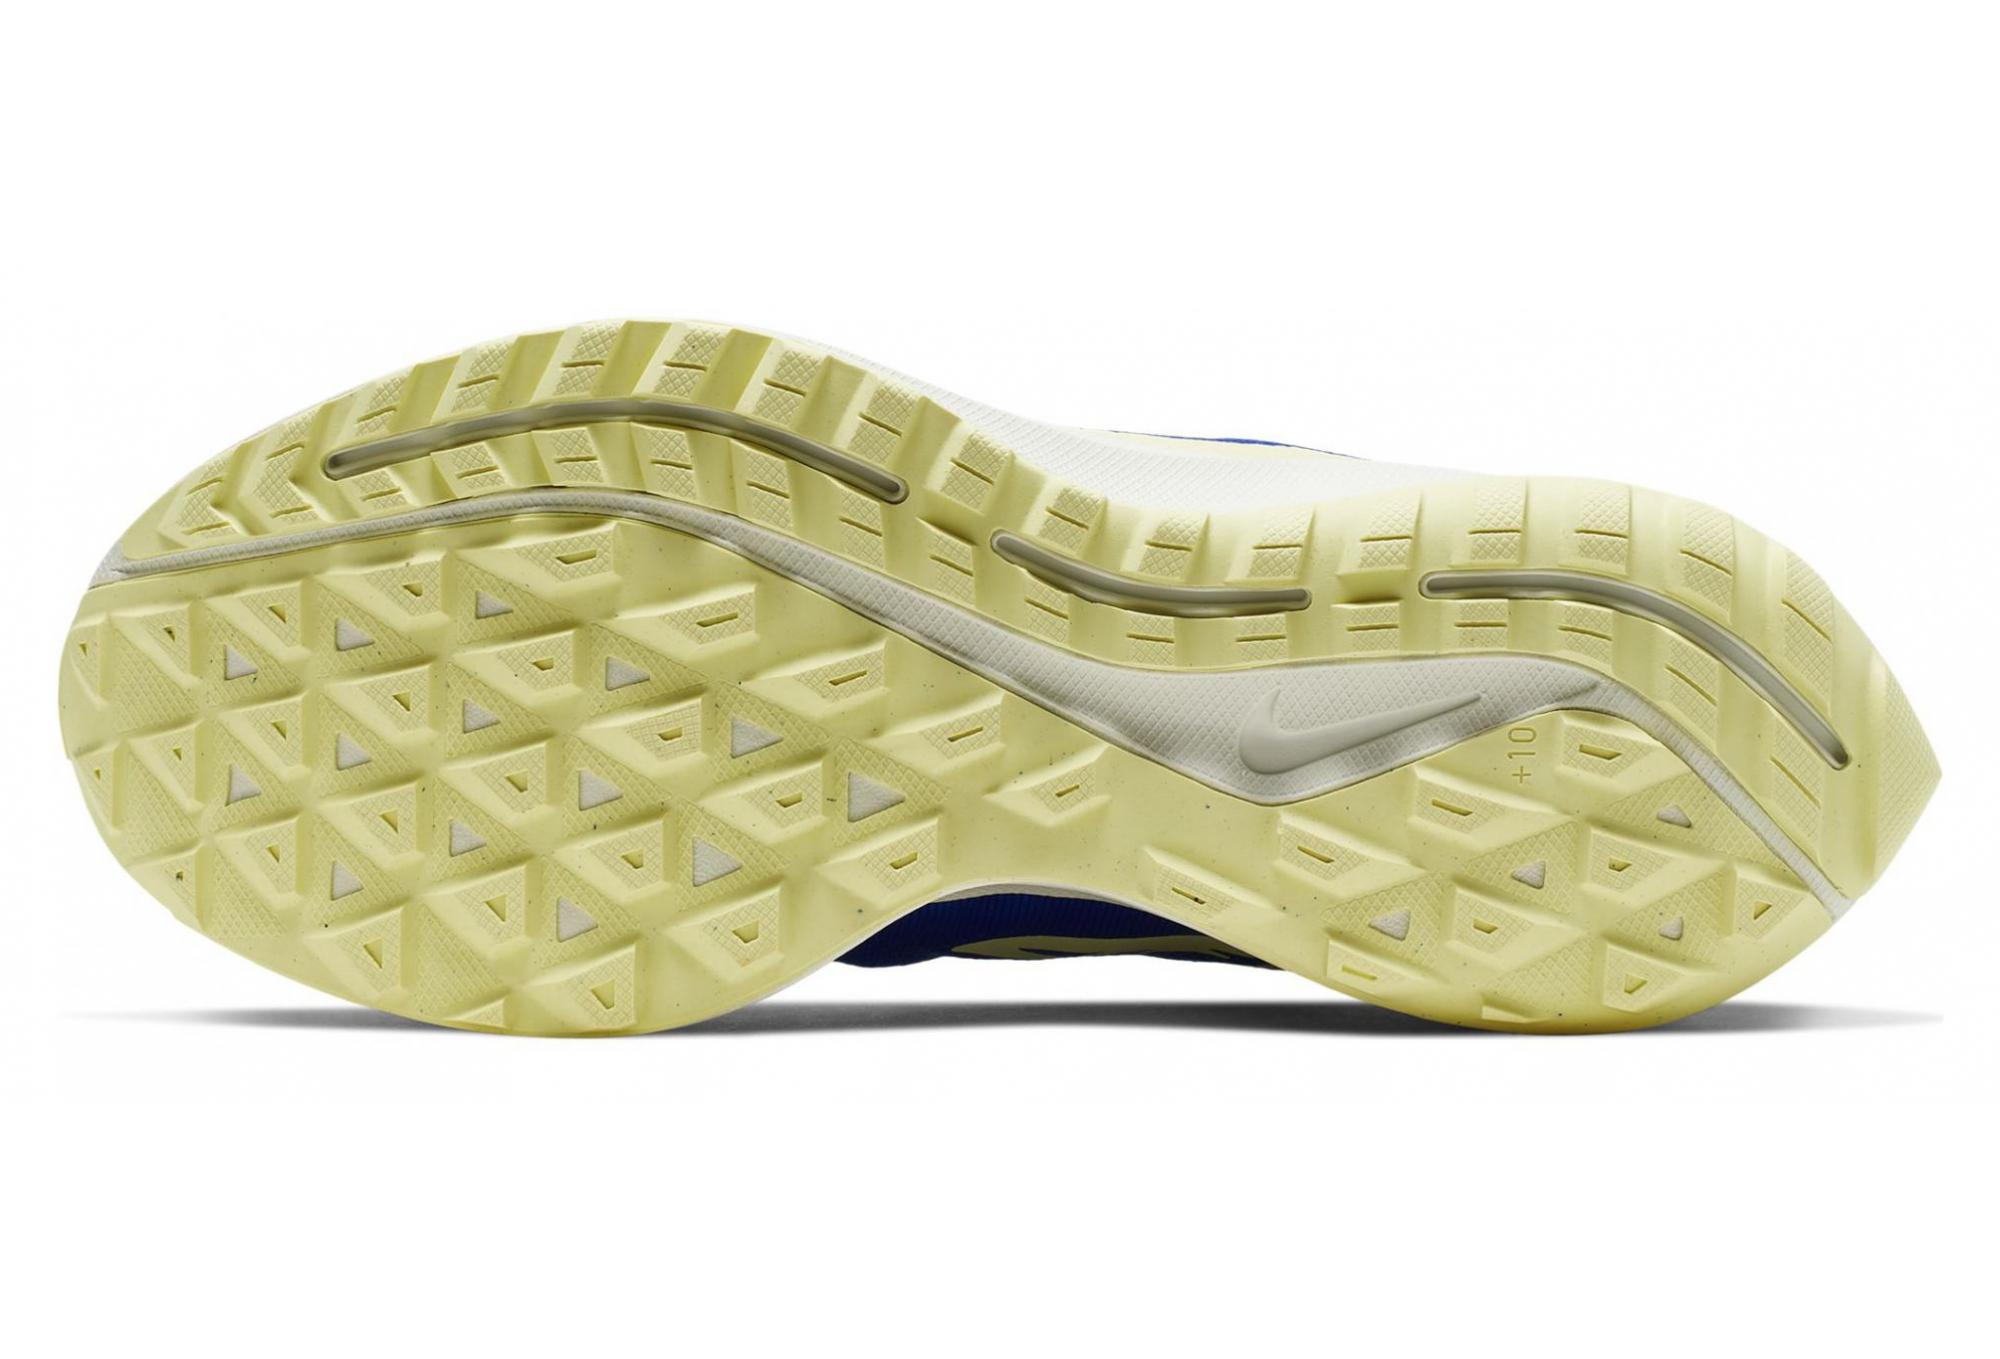 Descuento continuar Zapatos Hombre Nike Air Zoom Pegasus 31